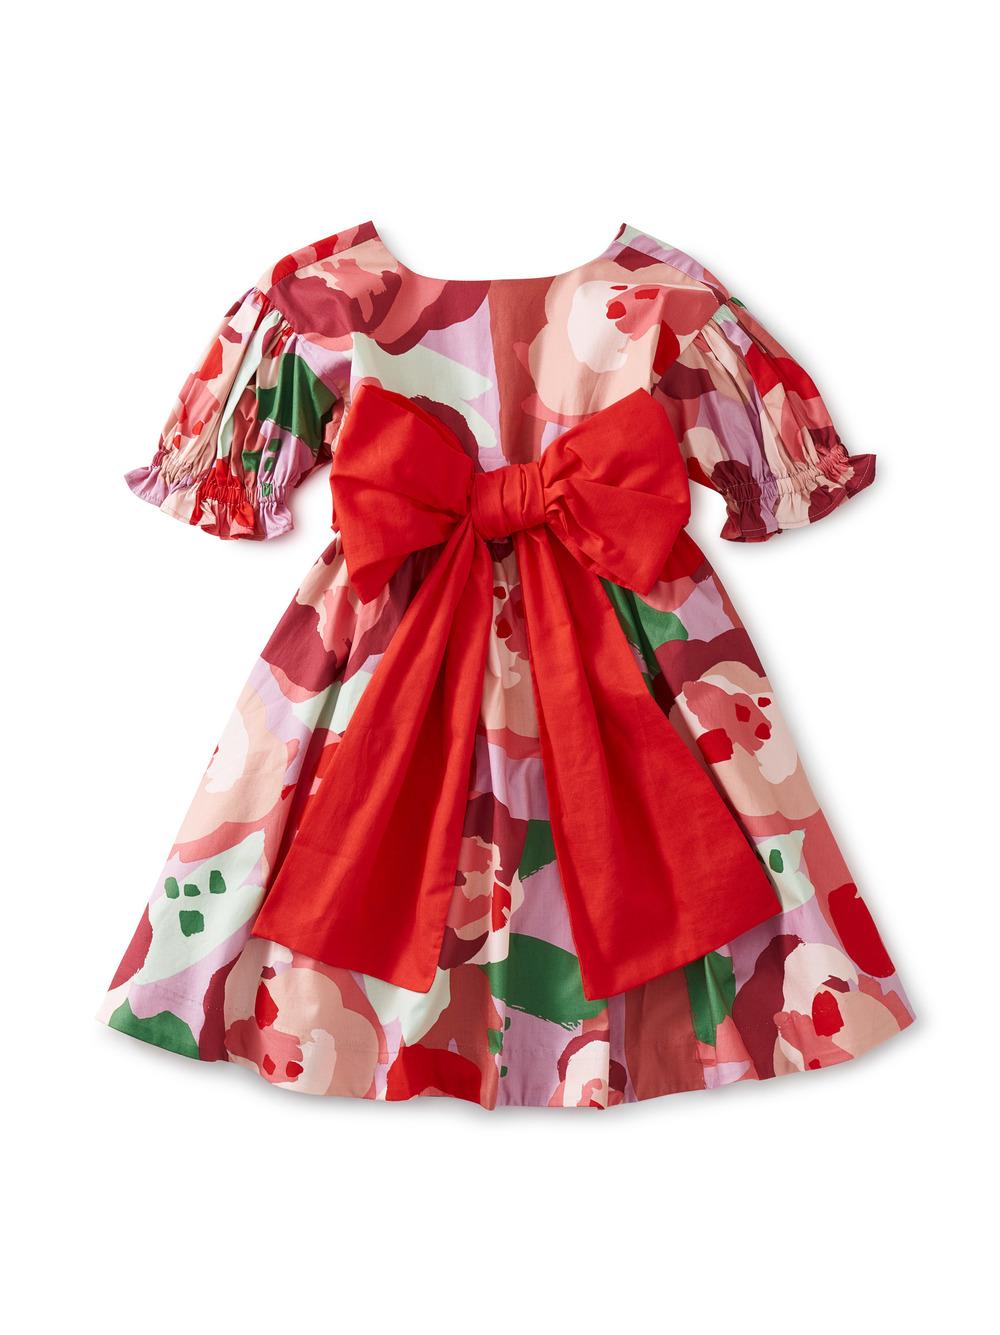 Floral Sash Dress